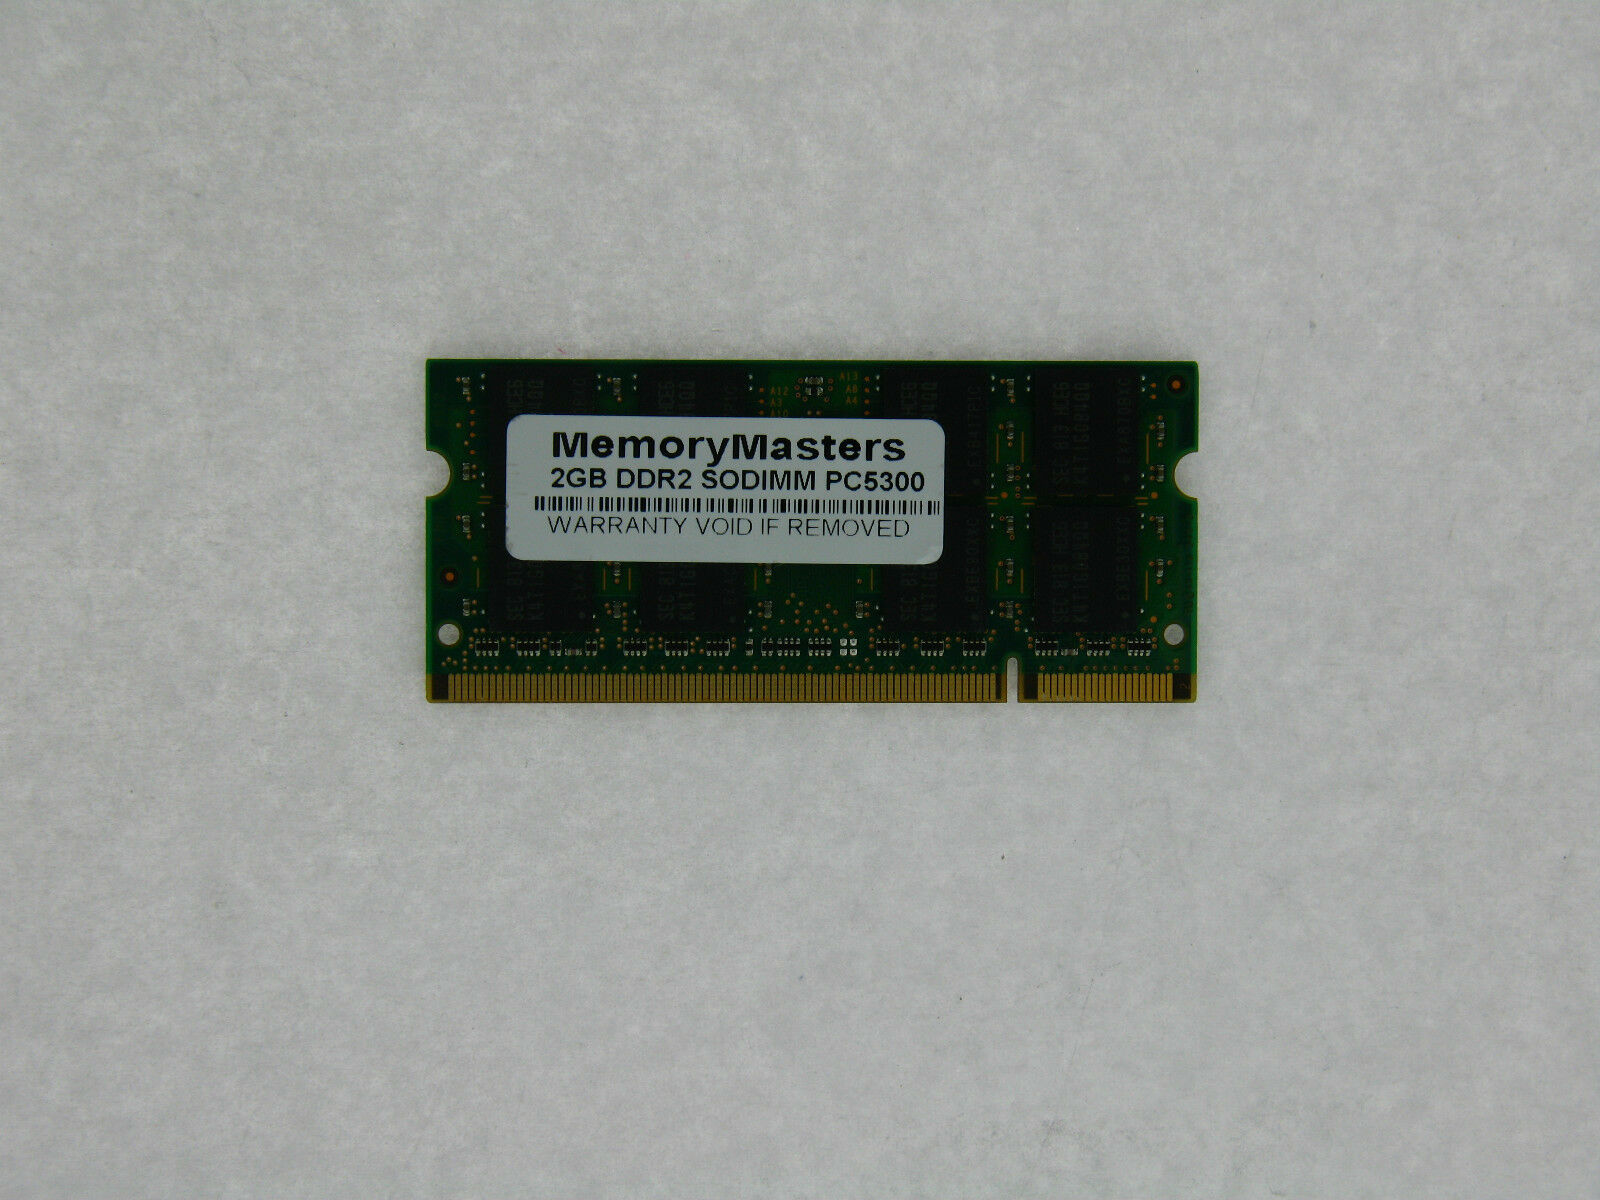 2GB MEMORY FOR ACER EMACHINES  422G16 422G25MI 423G16 423G16MI 423G25MI 4520 - $23.04